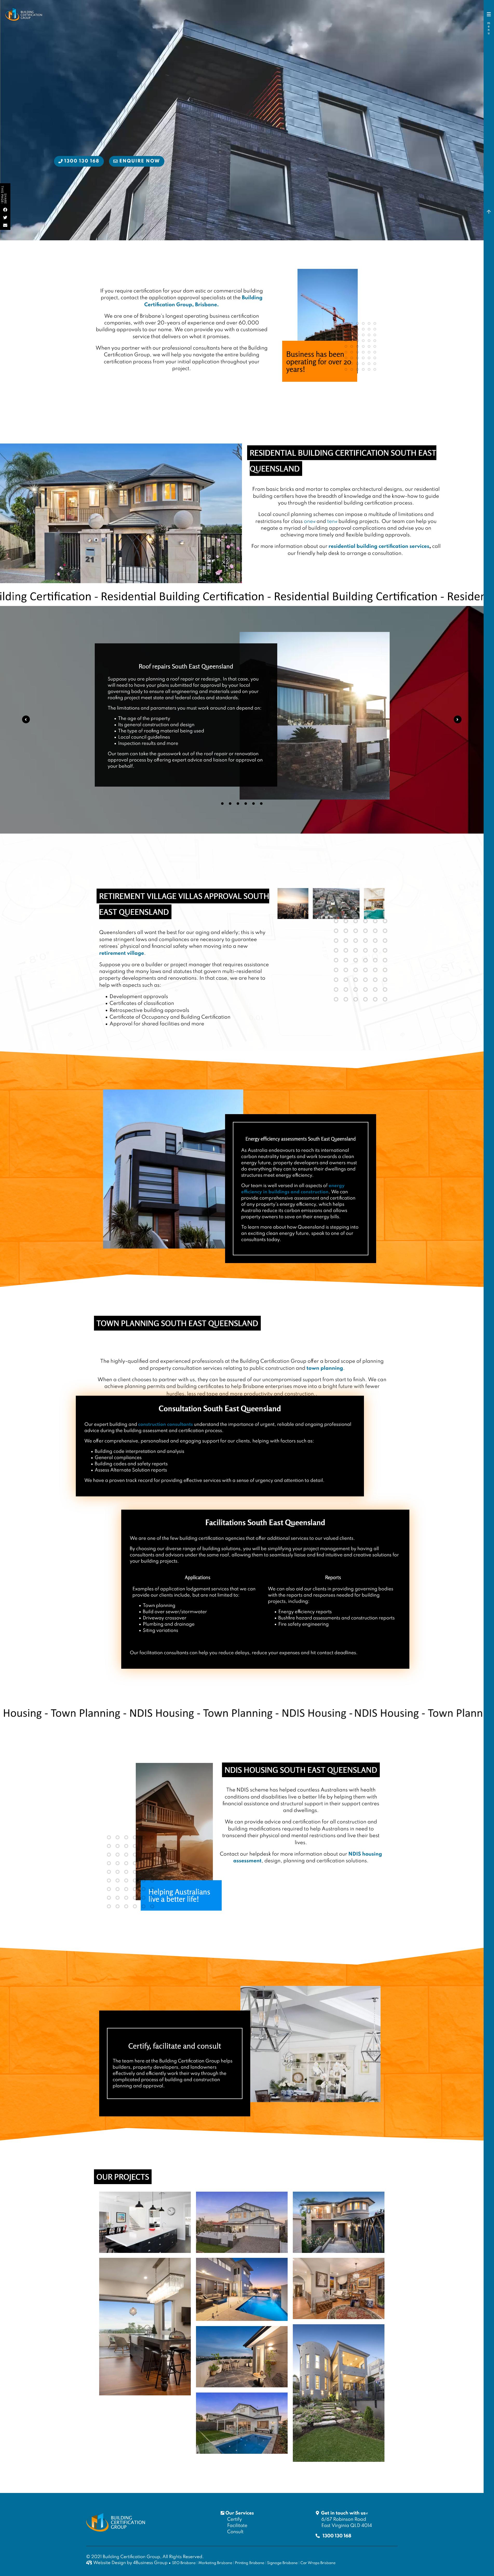 Building Certification Group: Desktop View